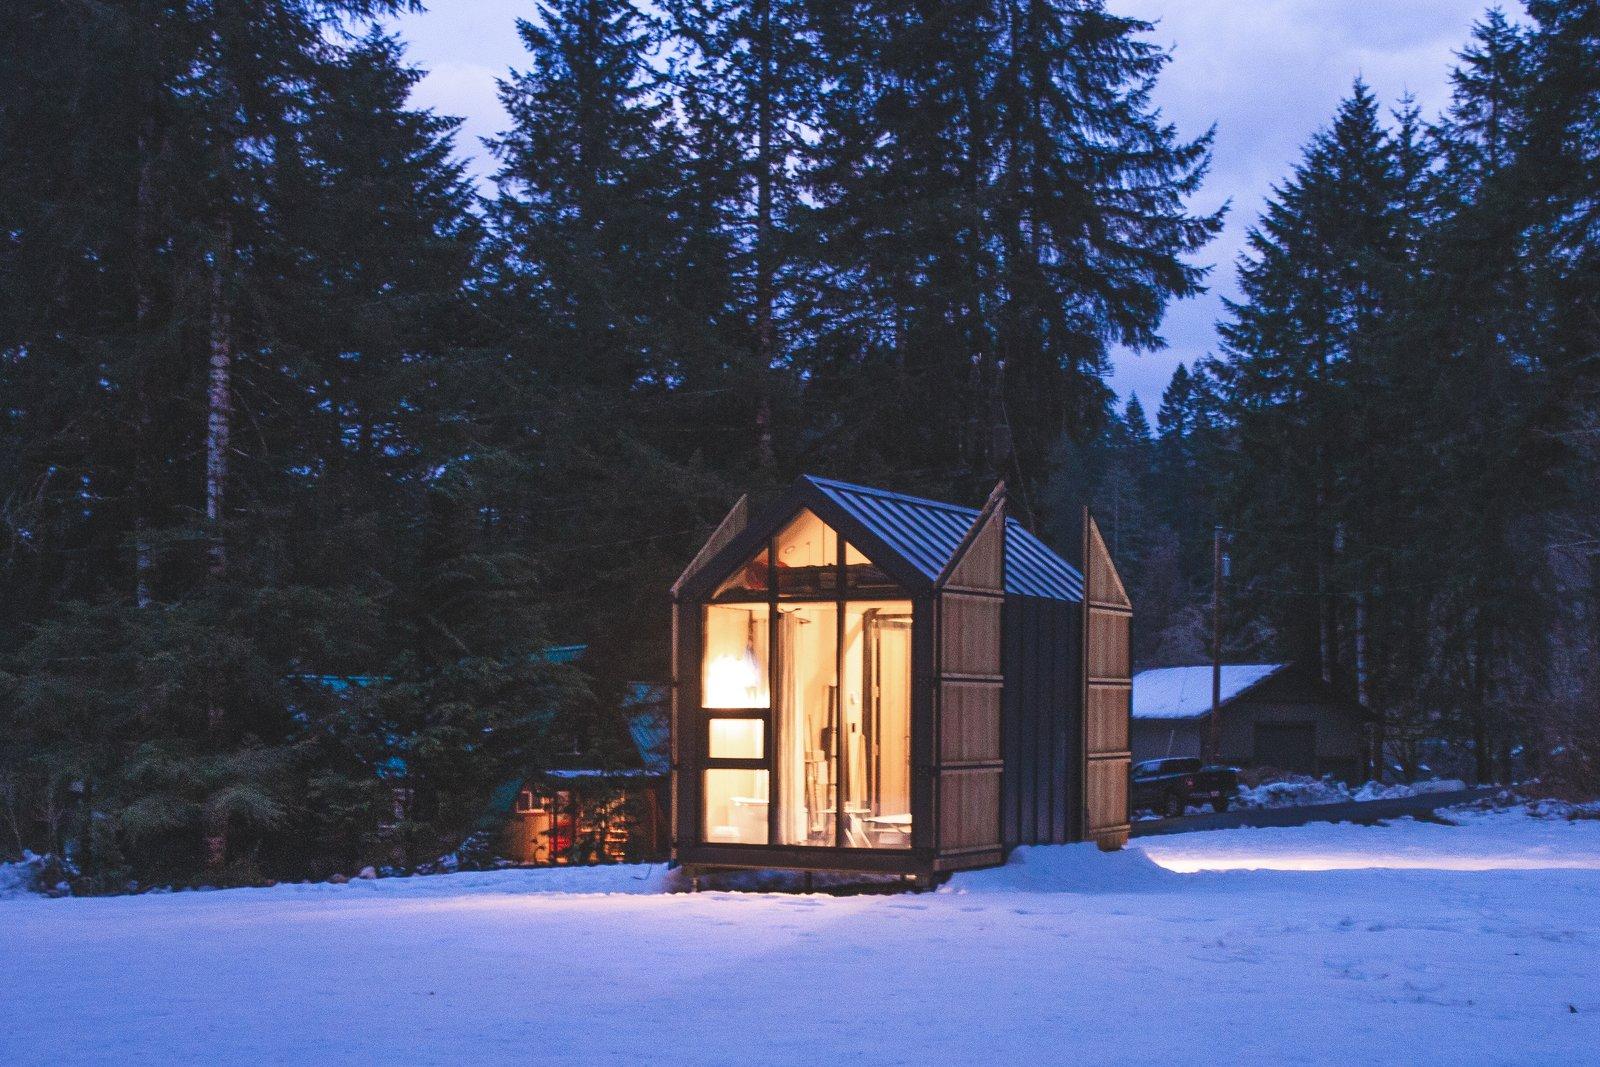 Elliot Mono prefab cabin exterior